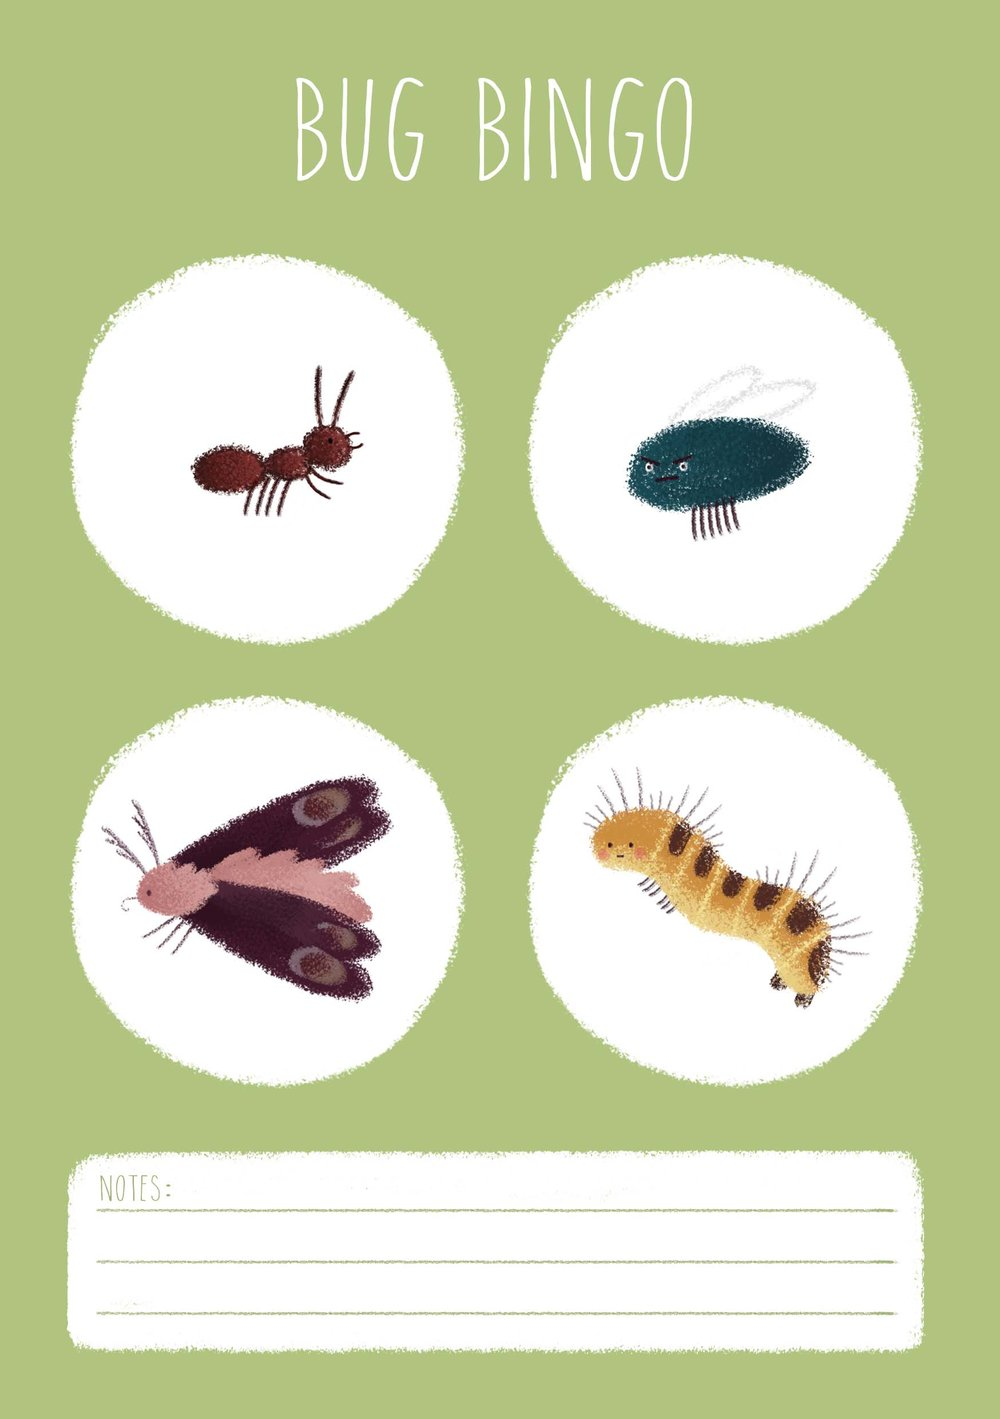 bugbingo4_.jpg